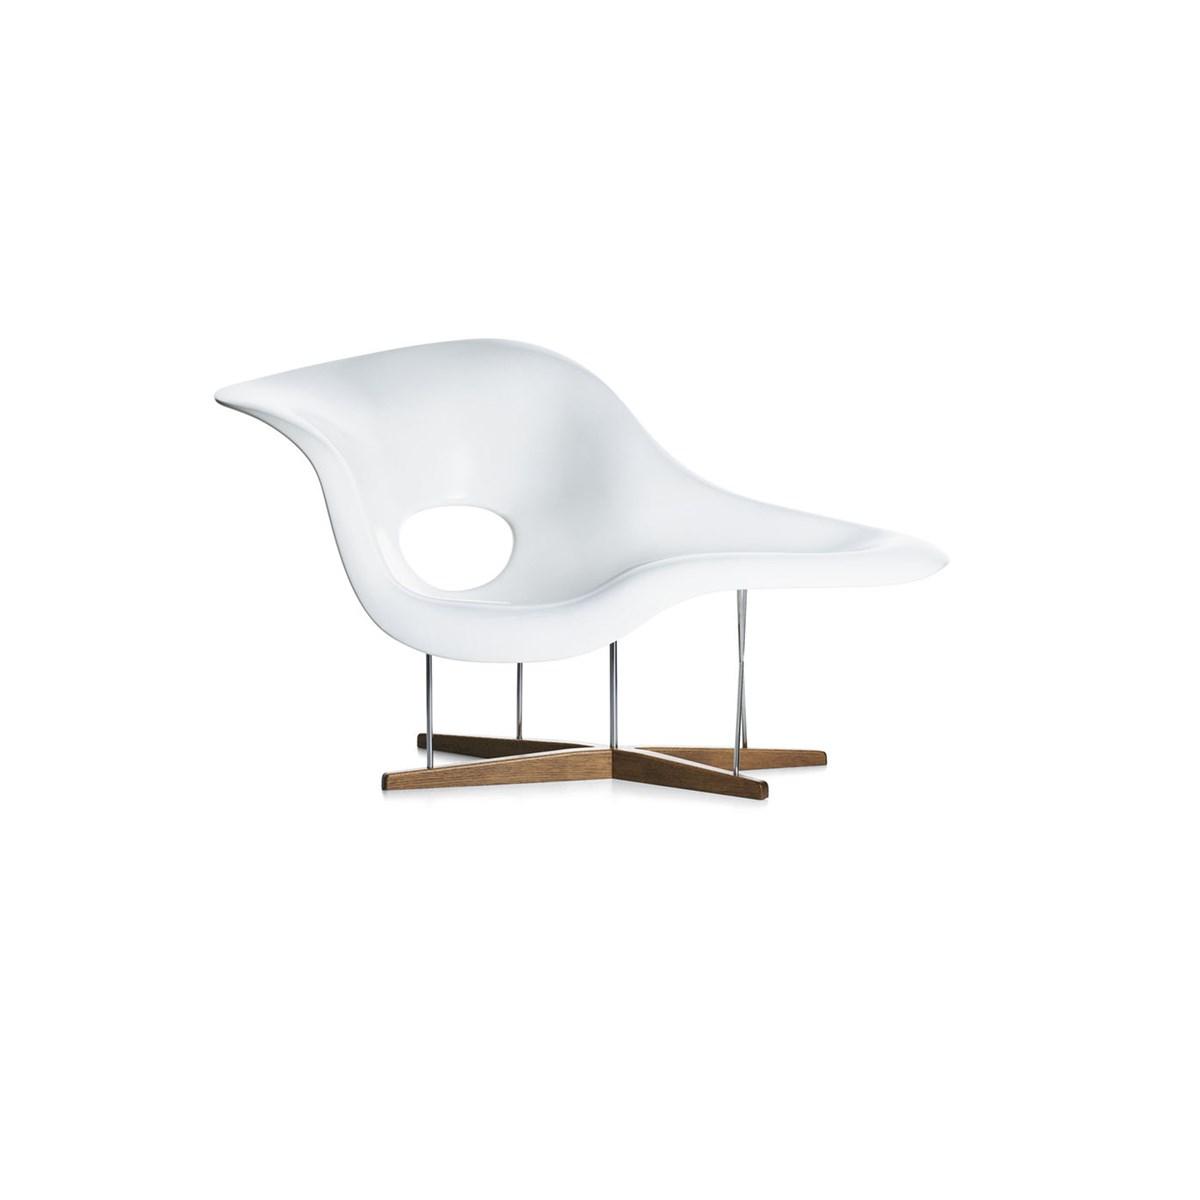 La Chaise Lounge Chair